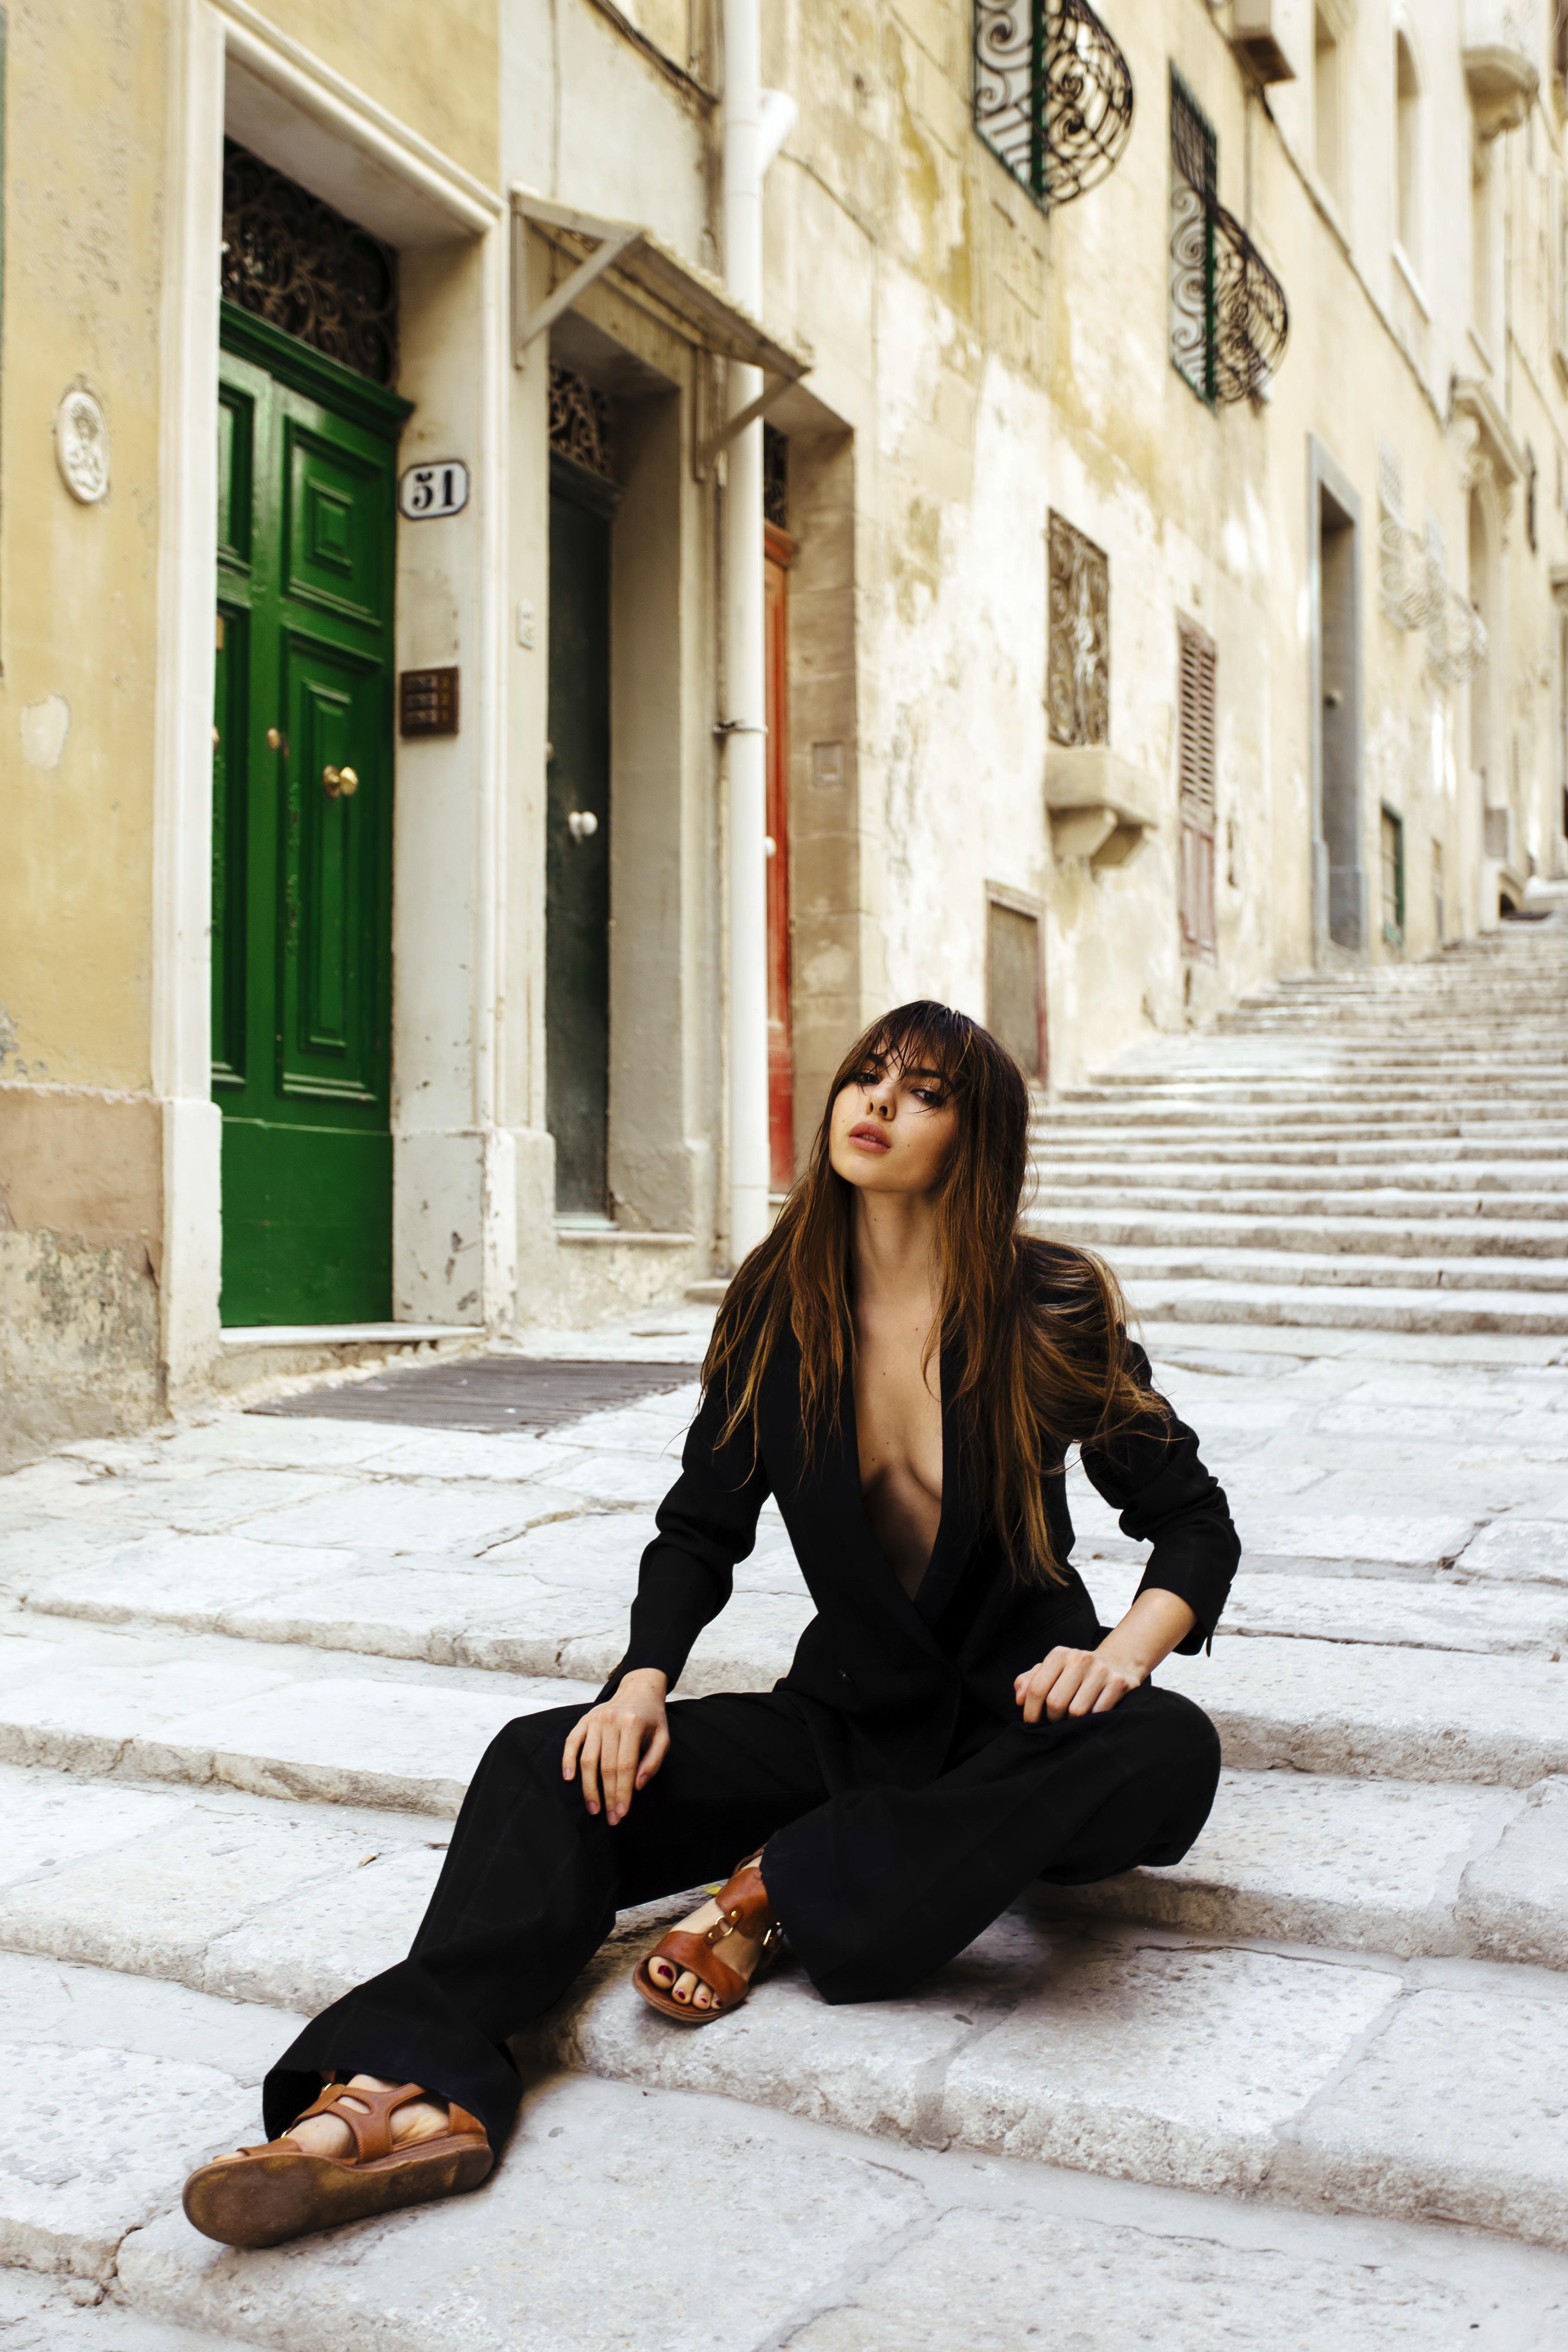 Doina on Social Media and Fashion